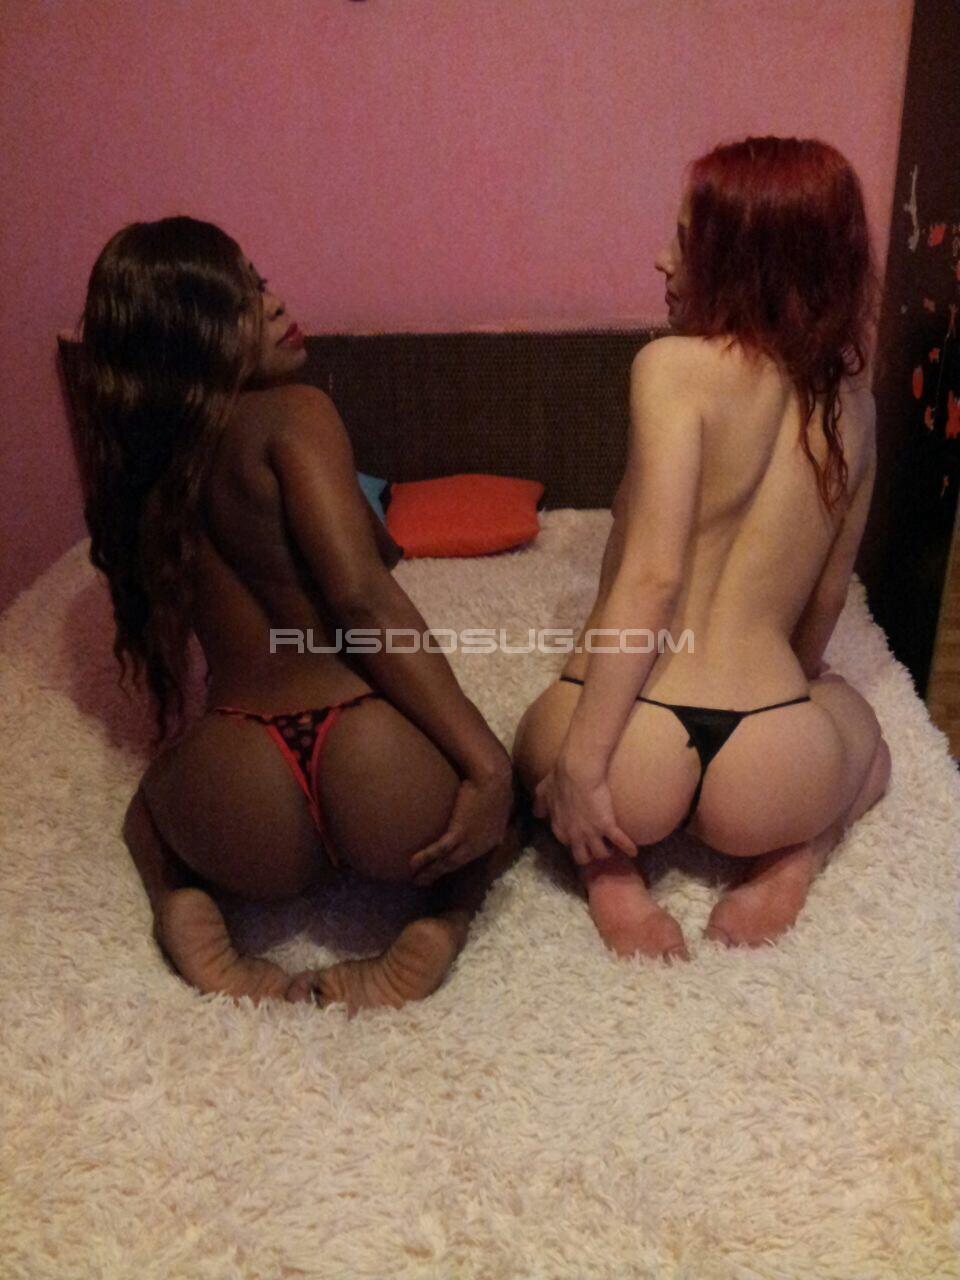 Проститутка Вероника и Мэри